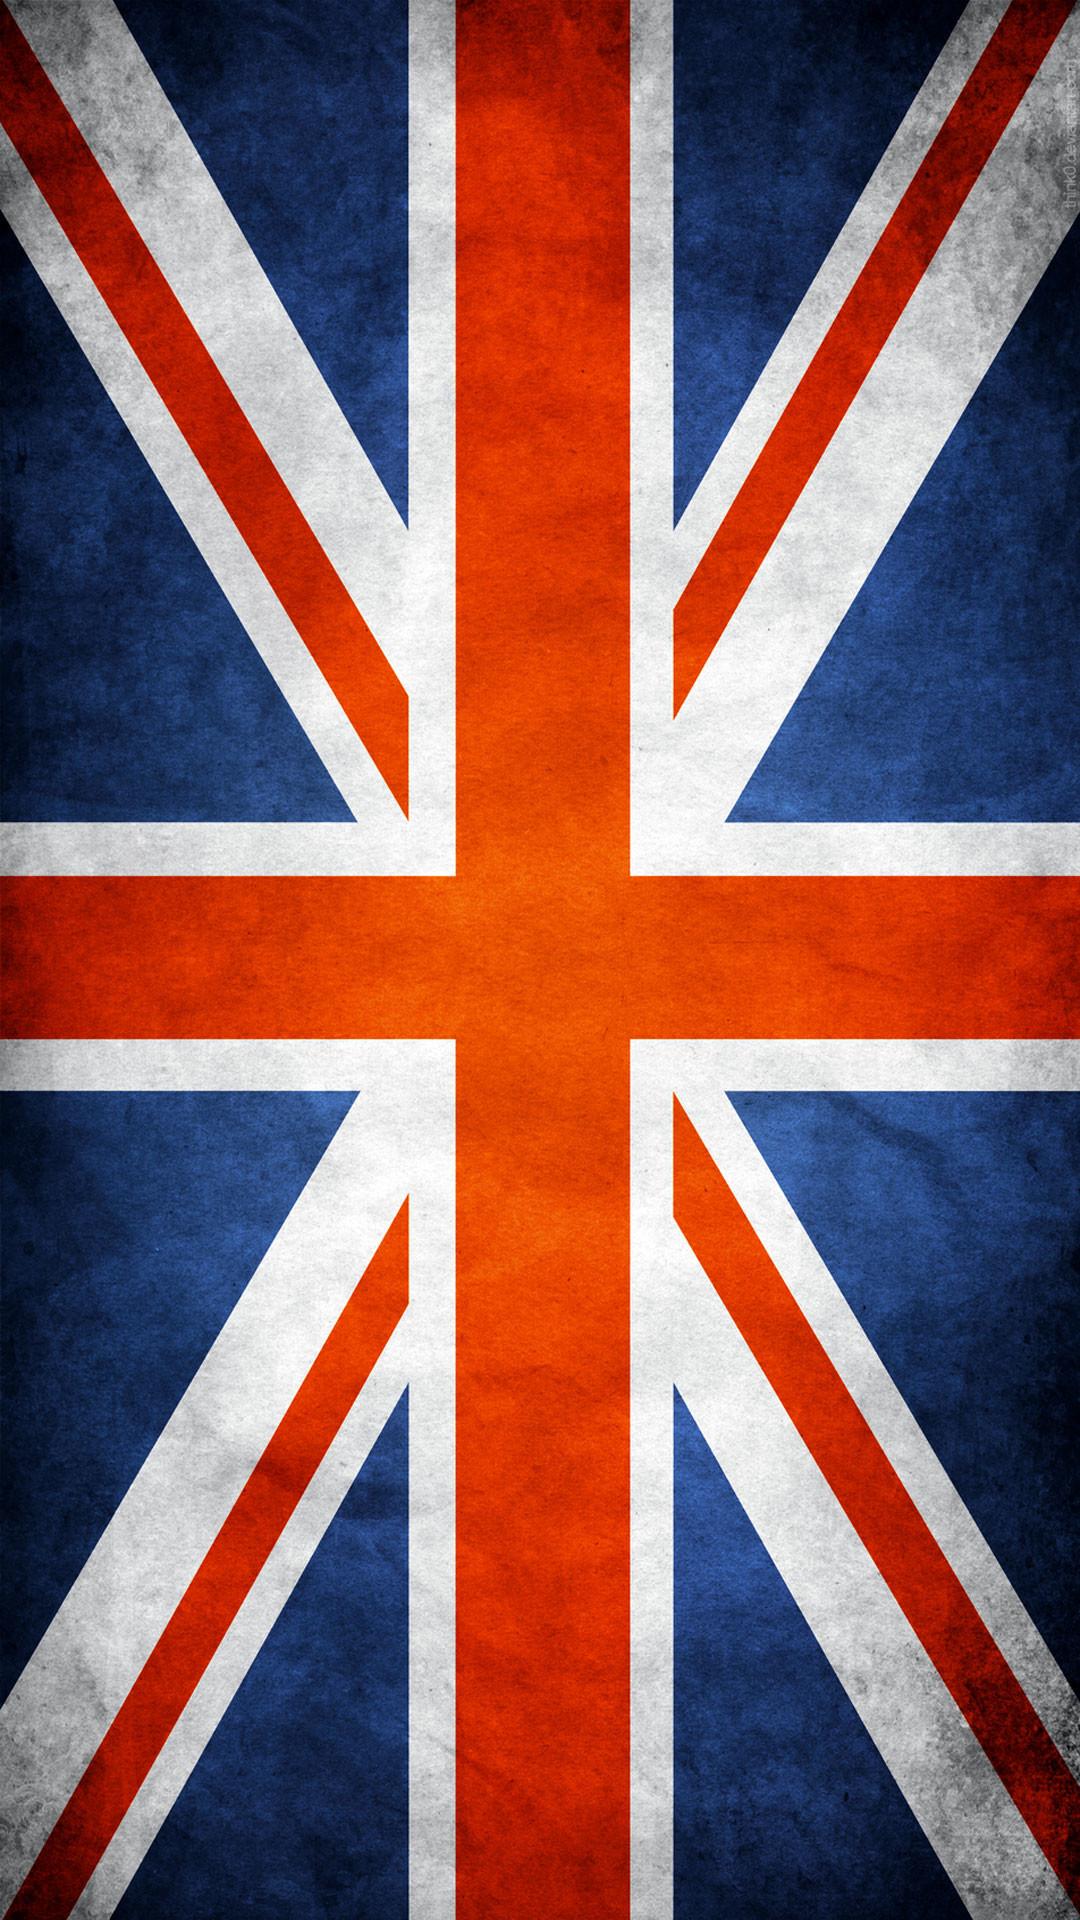 Britain UK Flag iPhone 6 Plus wallpaper